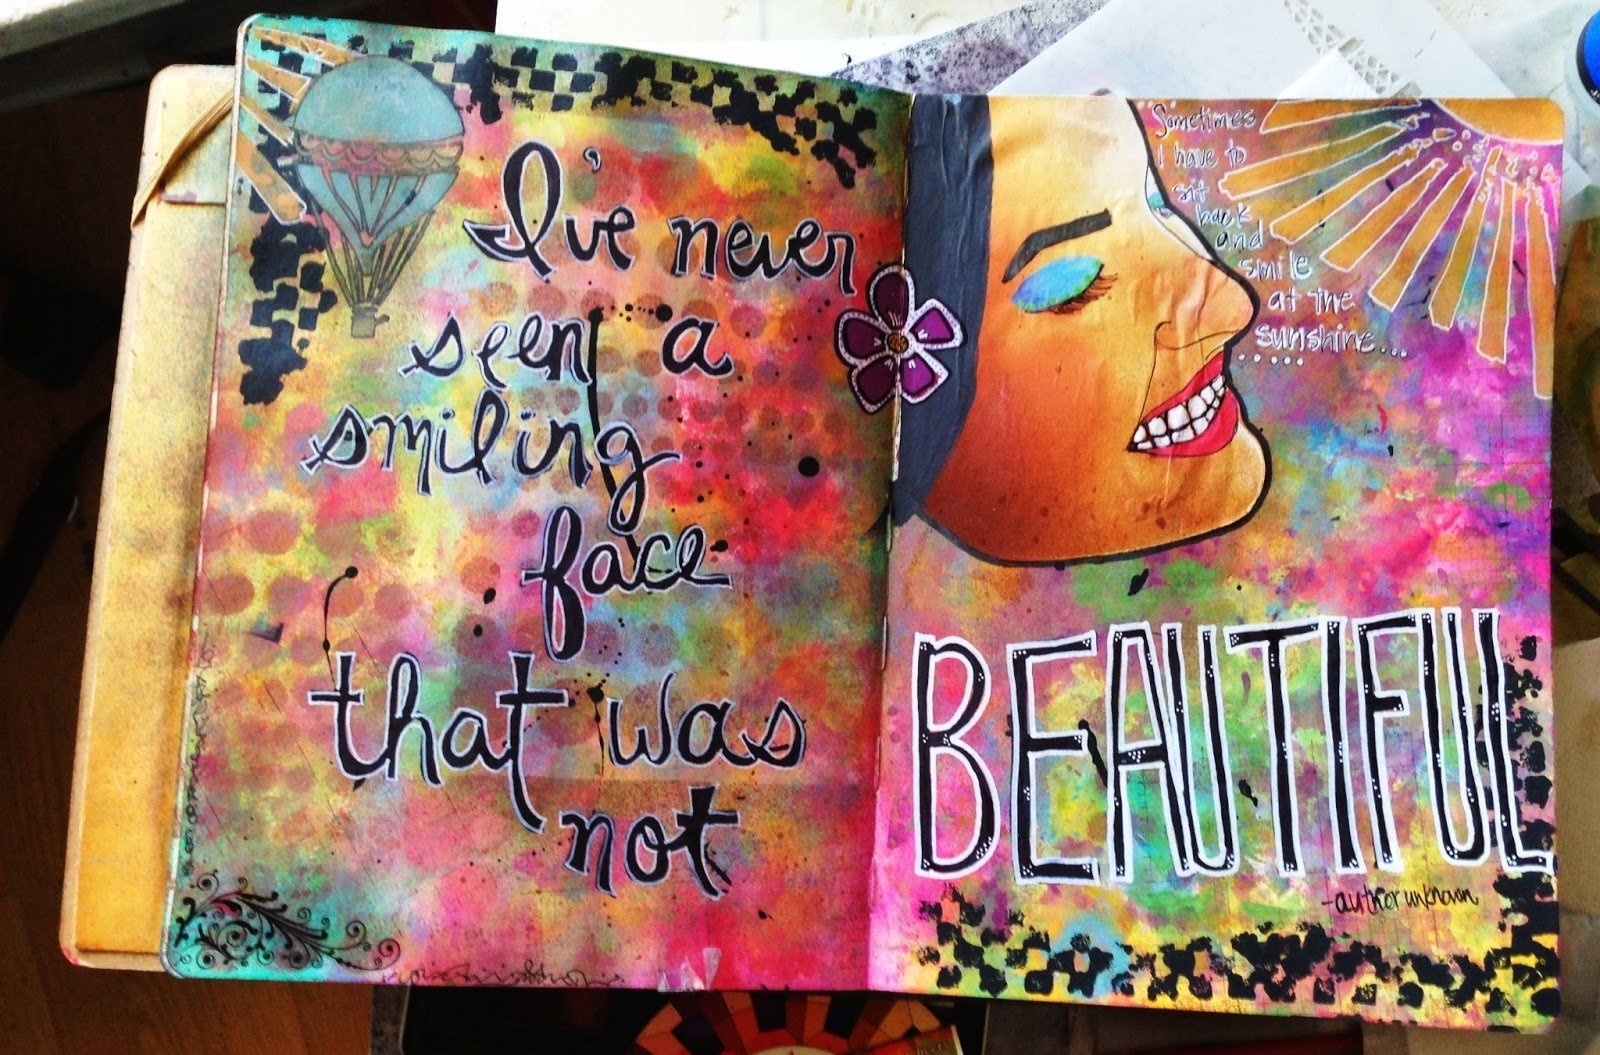 10 Most Popular Journal Ideas For High School saras never never la la land art journal page smiling face 2021